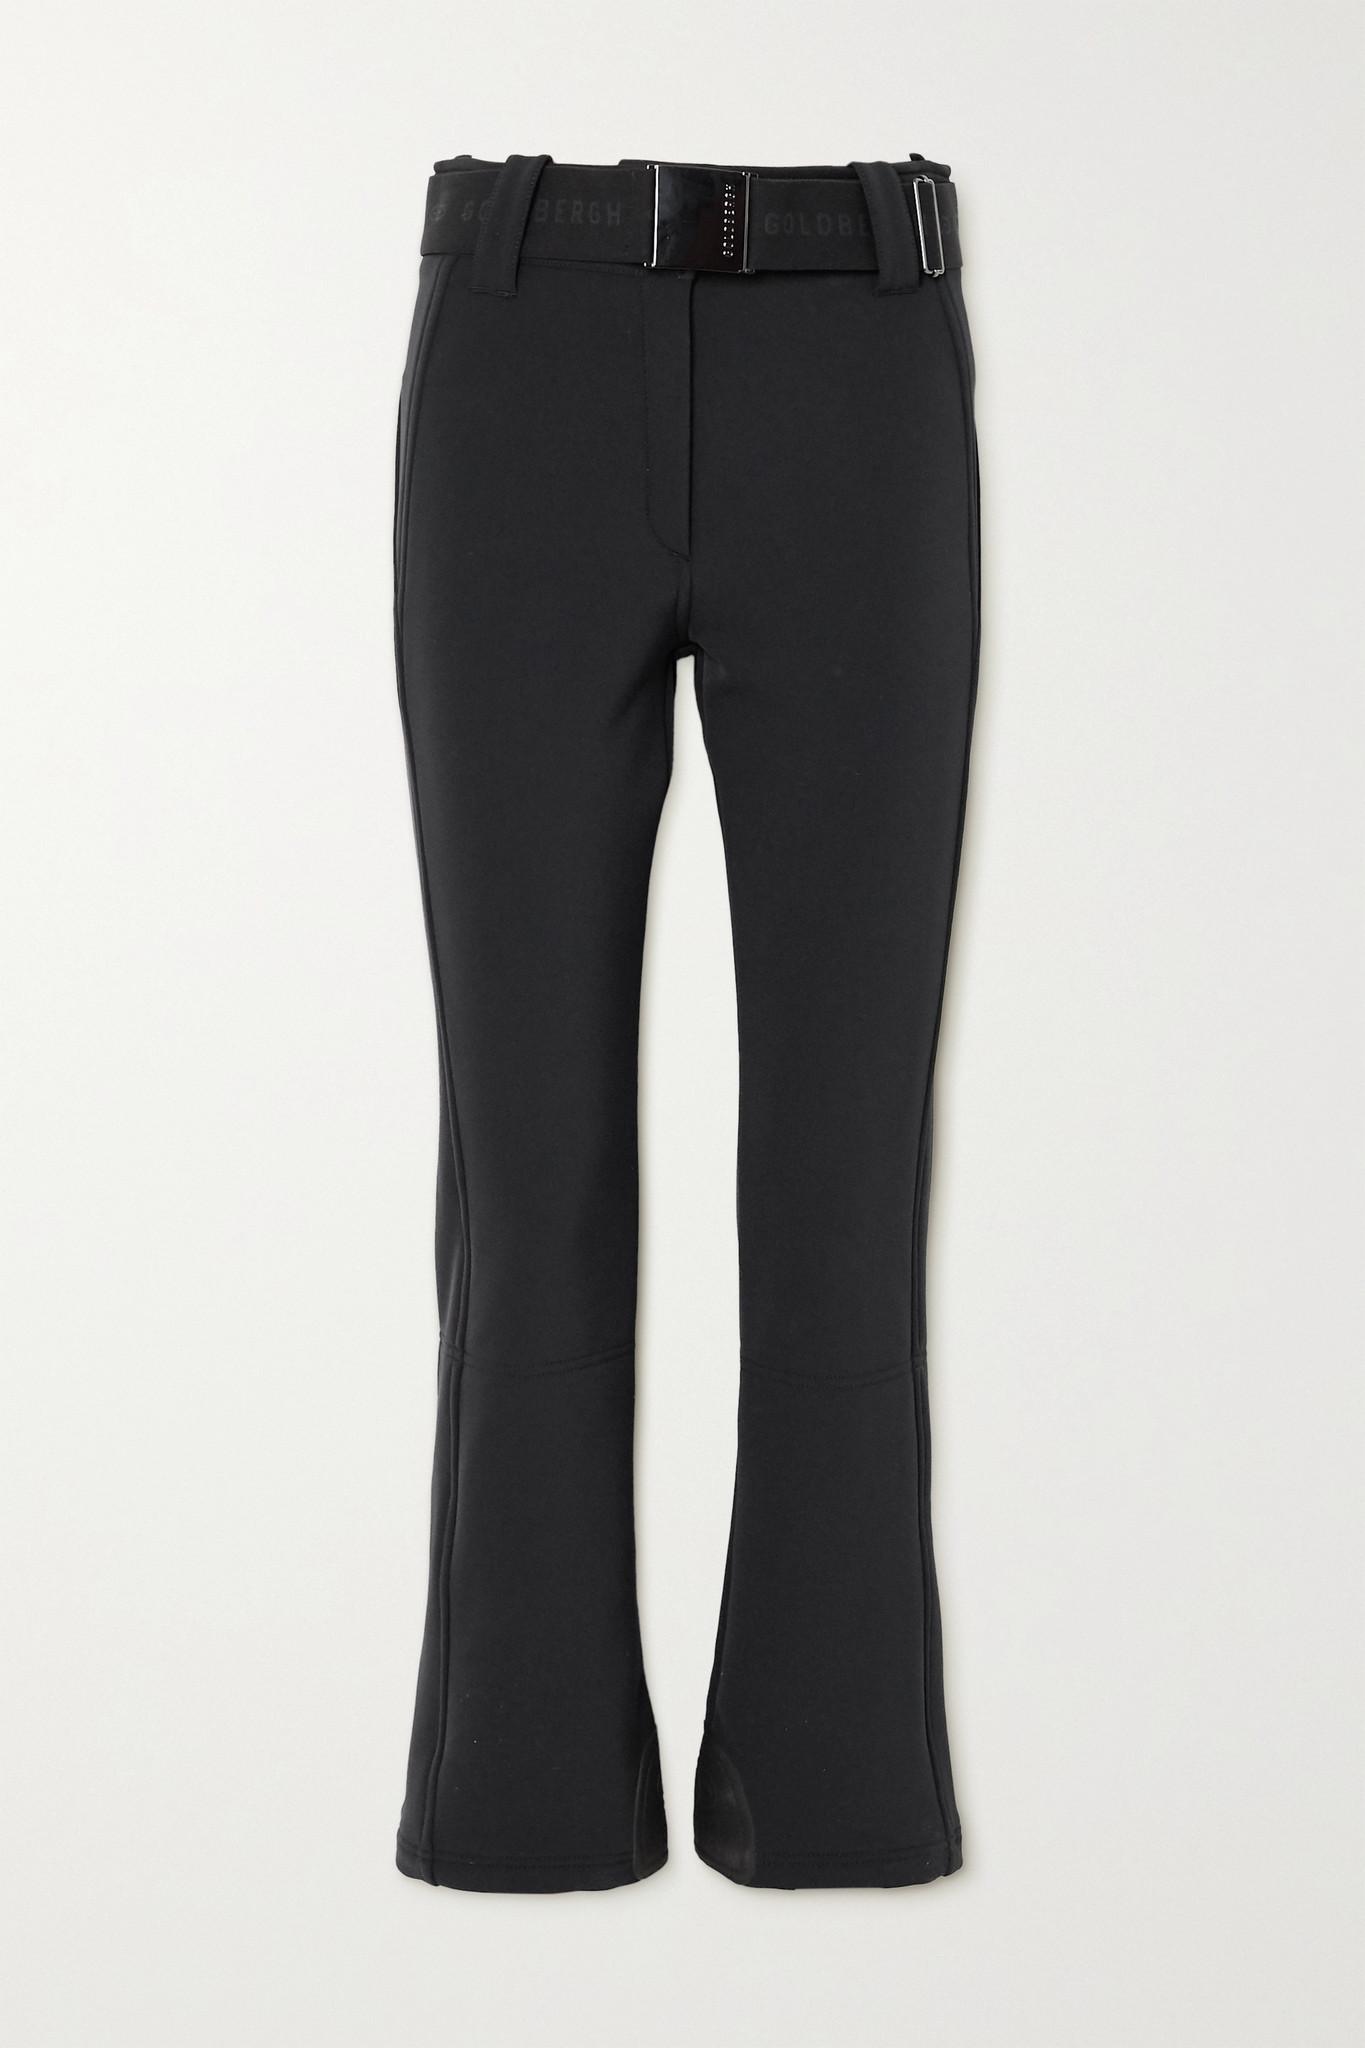 GOLDBERGH - Pippa Belted Flared Ski Pants - Black - UK14